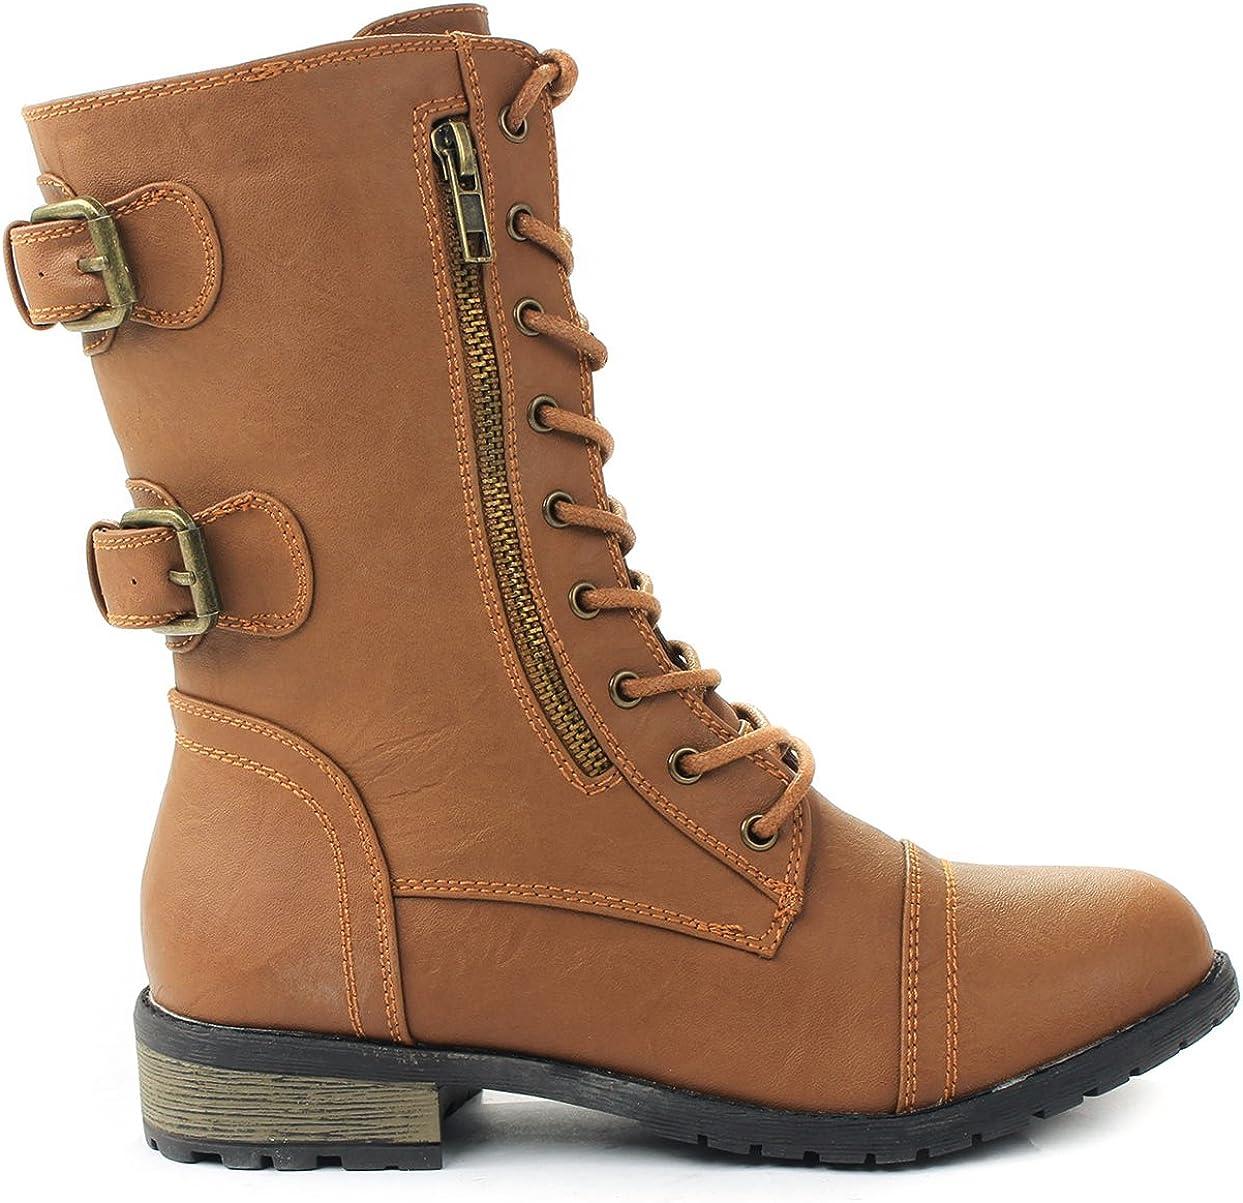 J.J.F Shoes Mango-61 Women Combat Lace Up Zip Grommet Buckle Mid Calf Motorcycle Boots